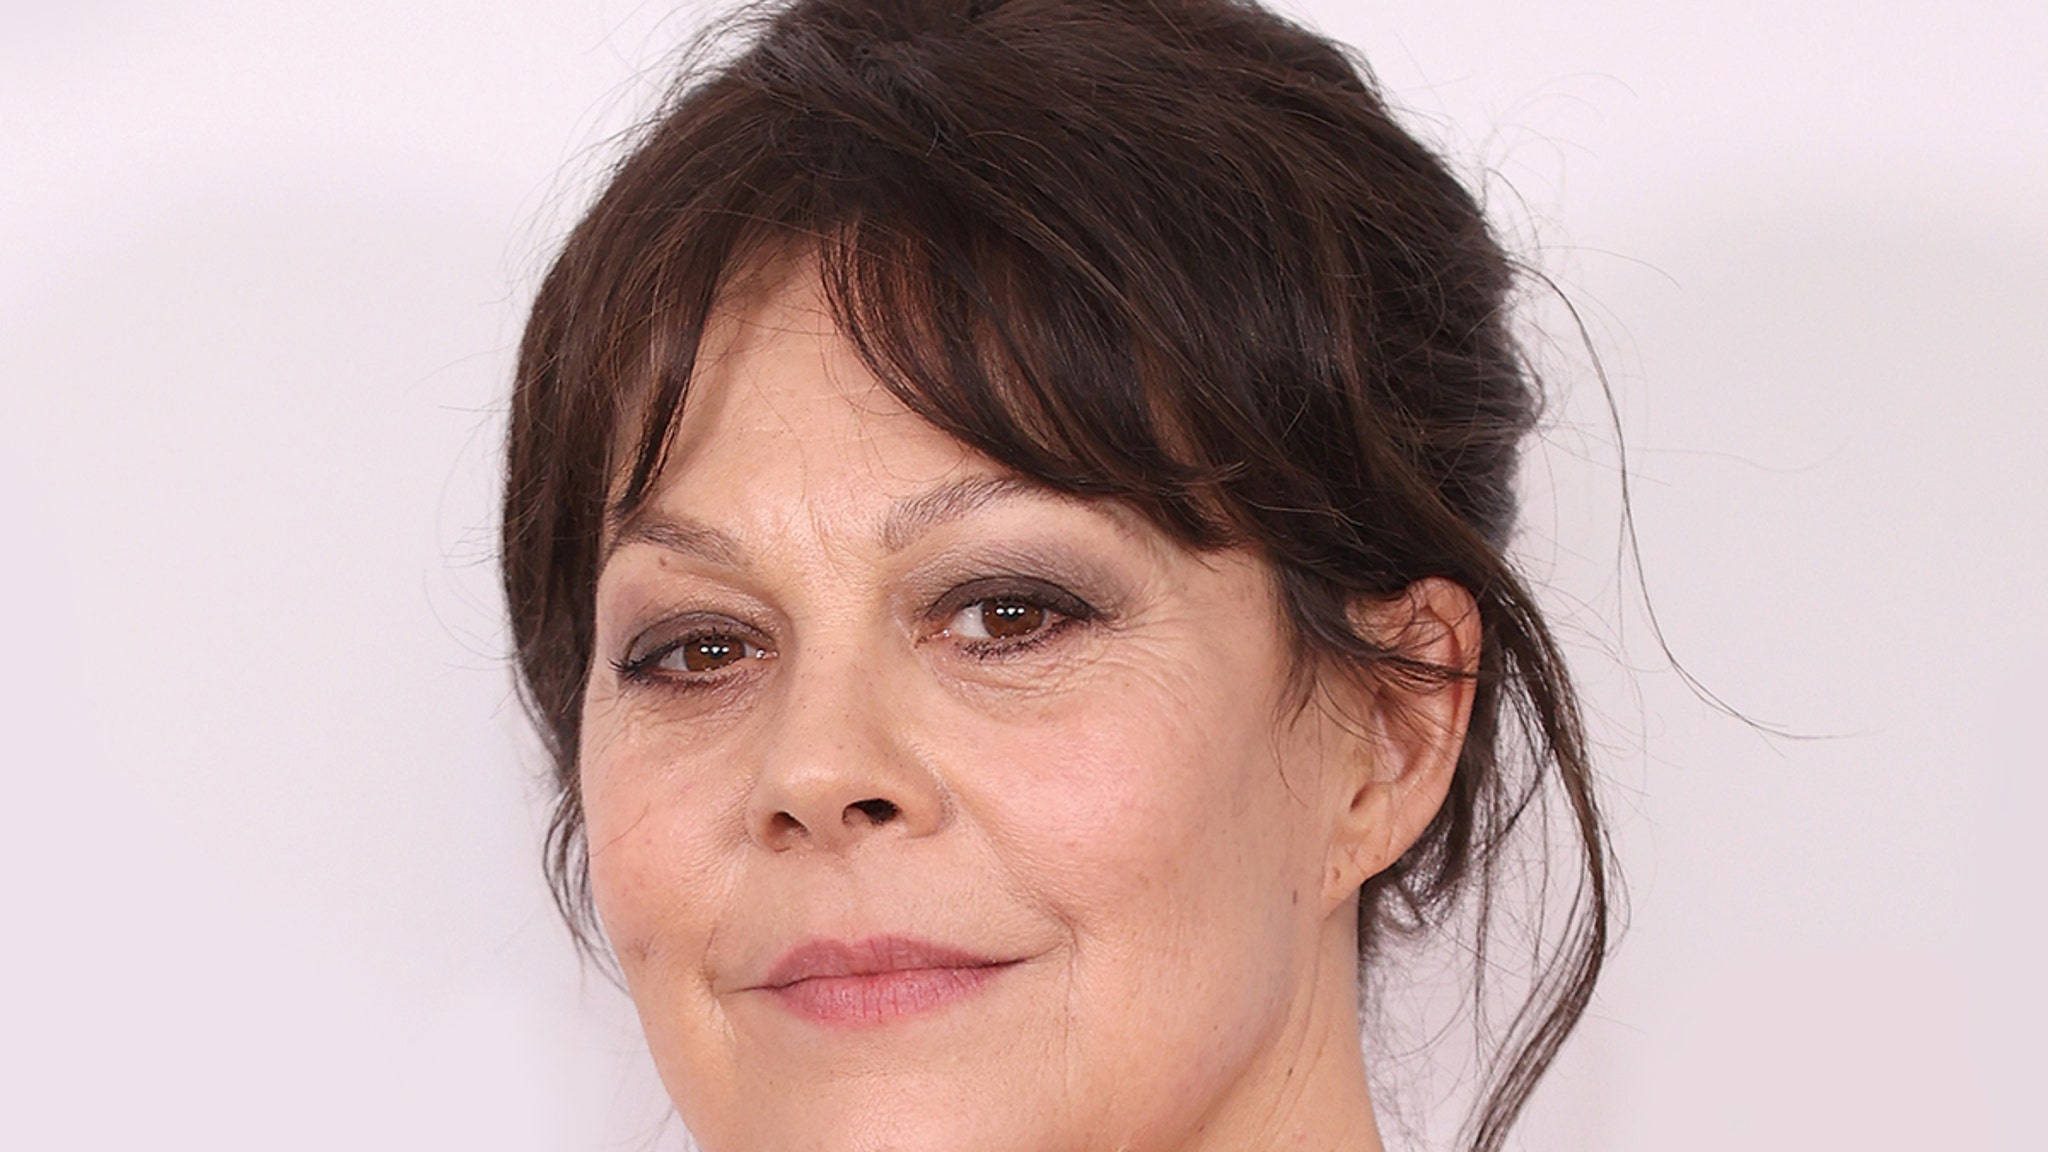 Helen McCrory, 'Peaky Blinders' & 'Harry Potter' Star, Dead at 52 thumbnail